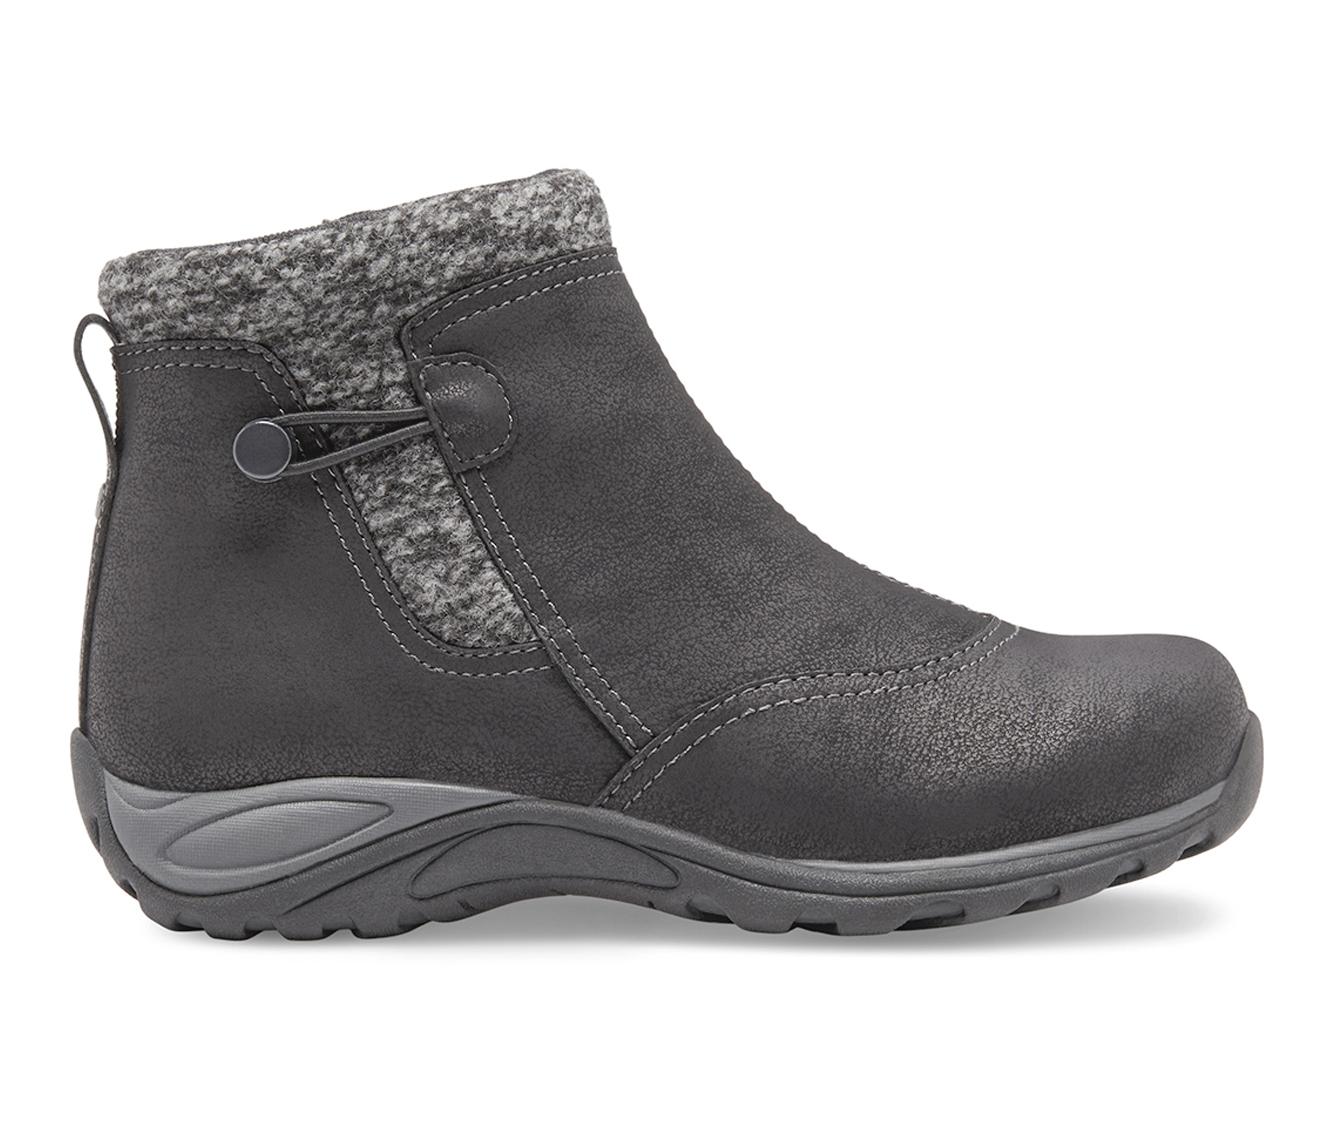 Eastland Bridget Women's Boot (Black Leather)